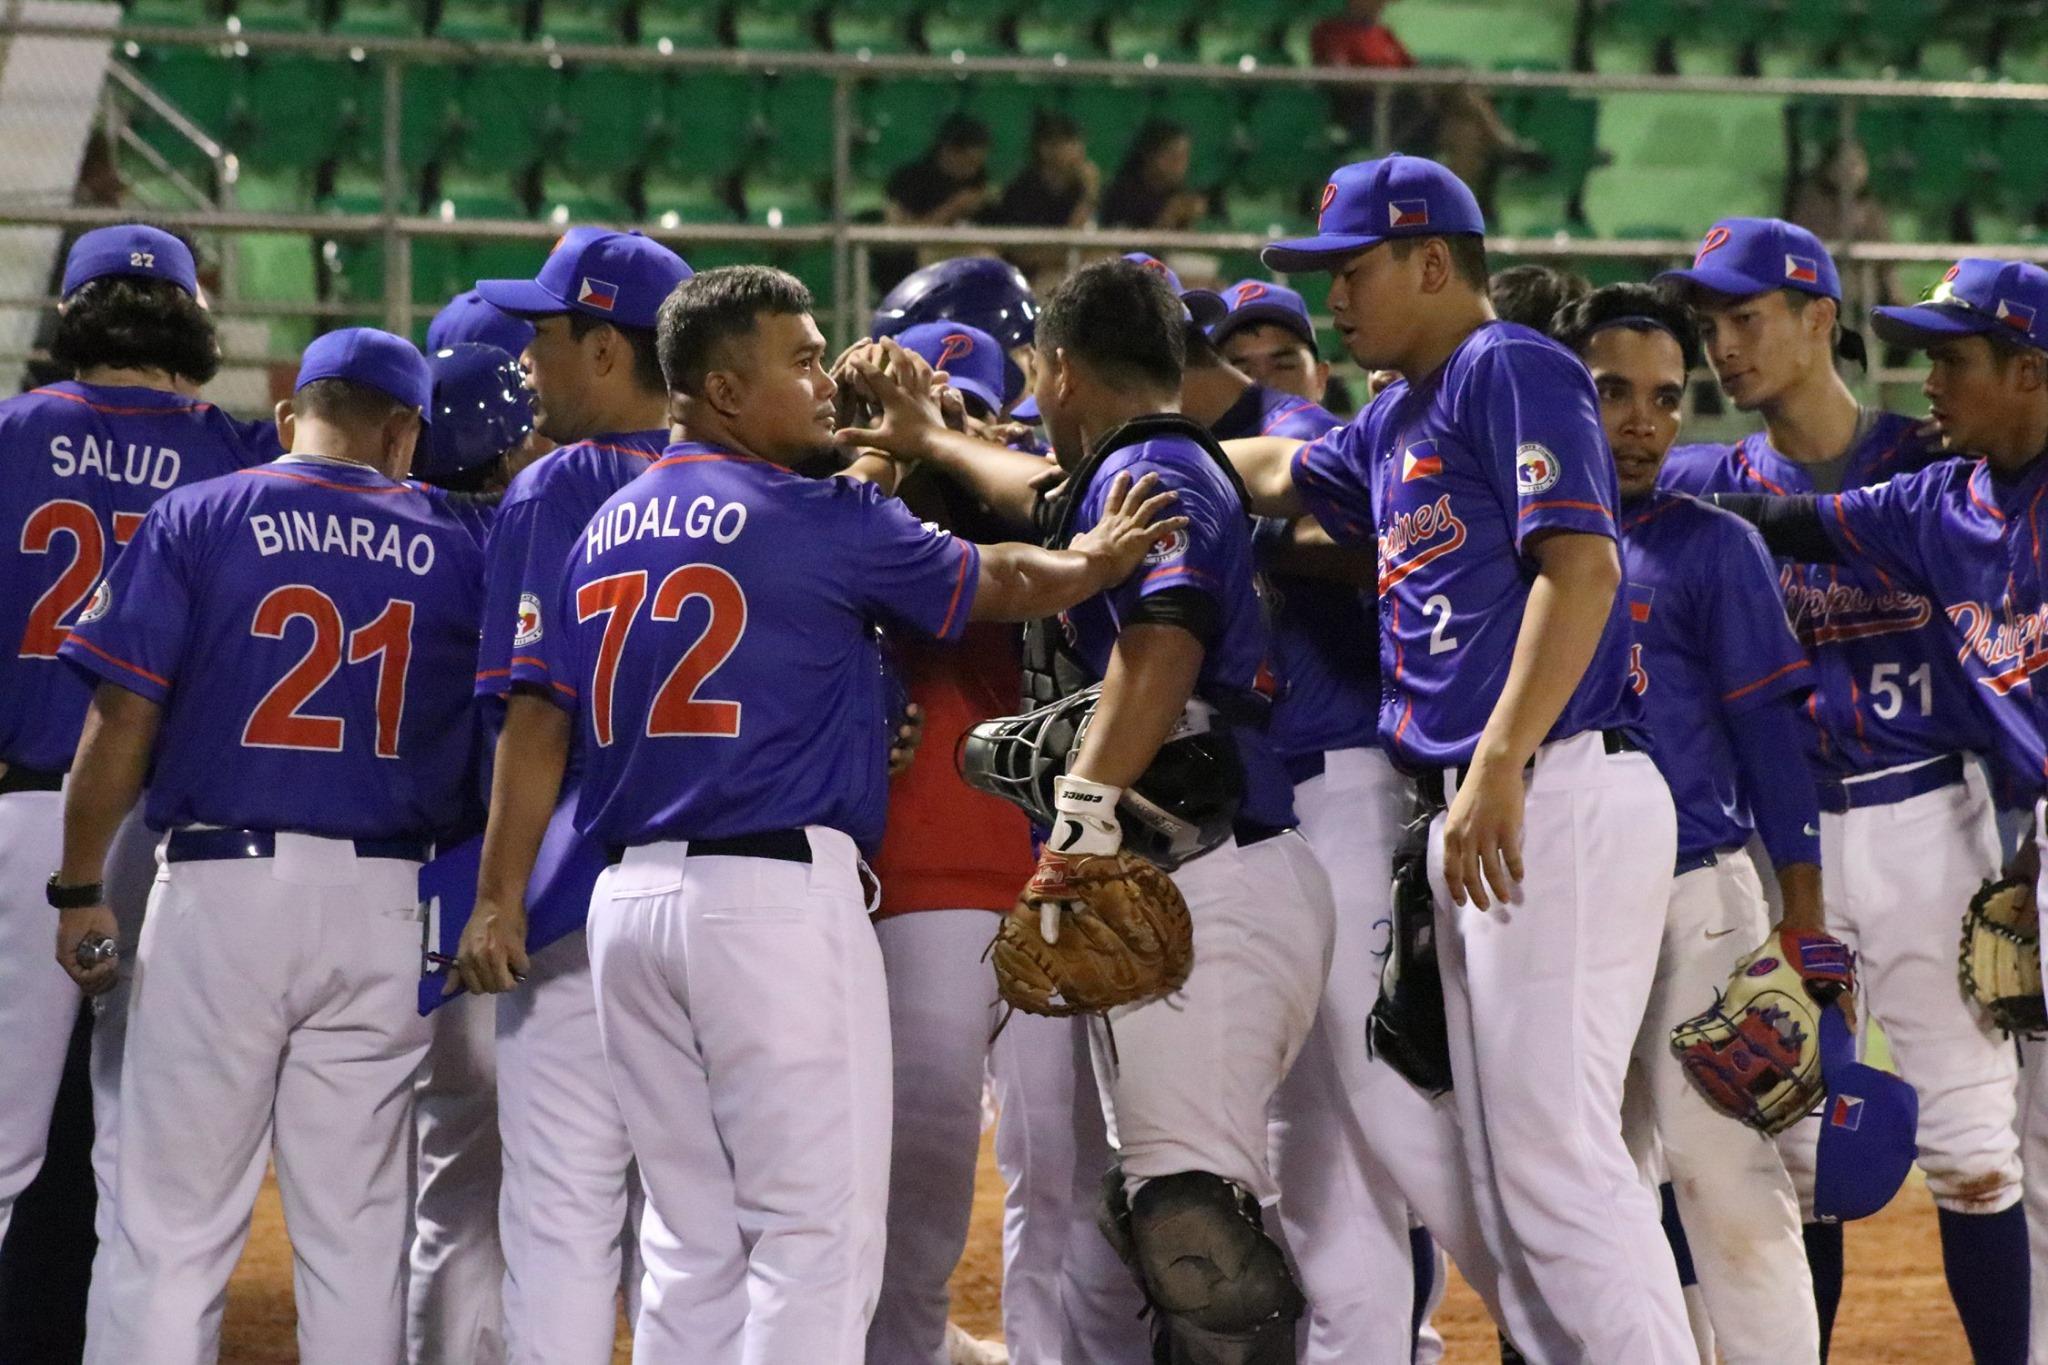 Tiebreaker Times Lozano, Pareja named to all-Asia Team, Bosito tallies most SBs Baseball News  Jennald Pareja Erwin Bosito Diego Lozano 2019 BFA Asian Championship